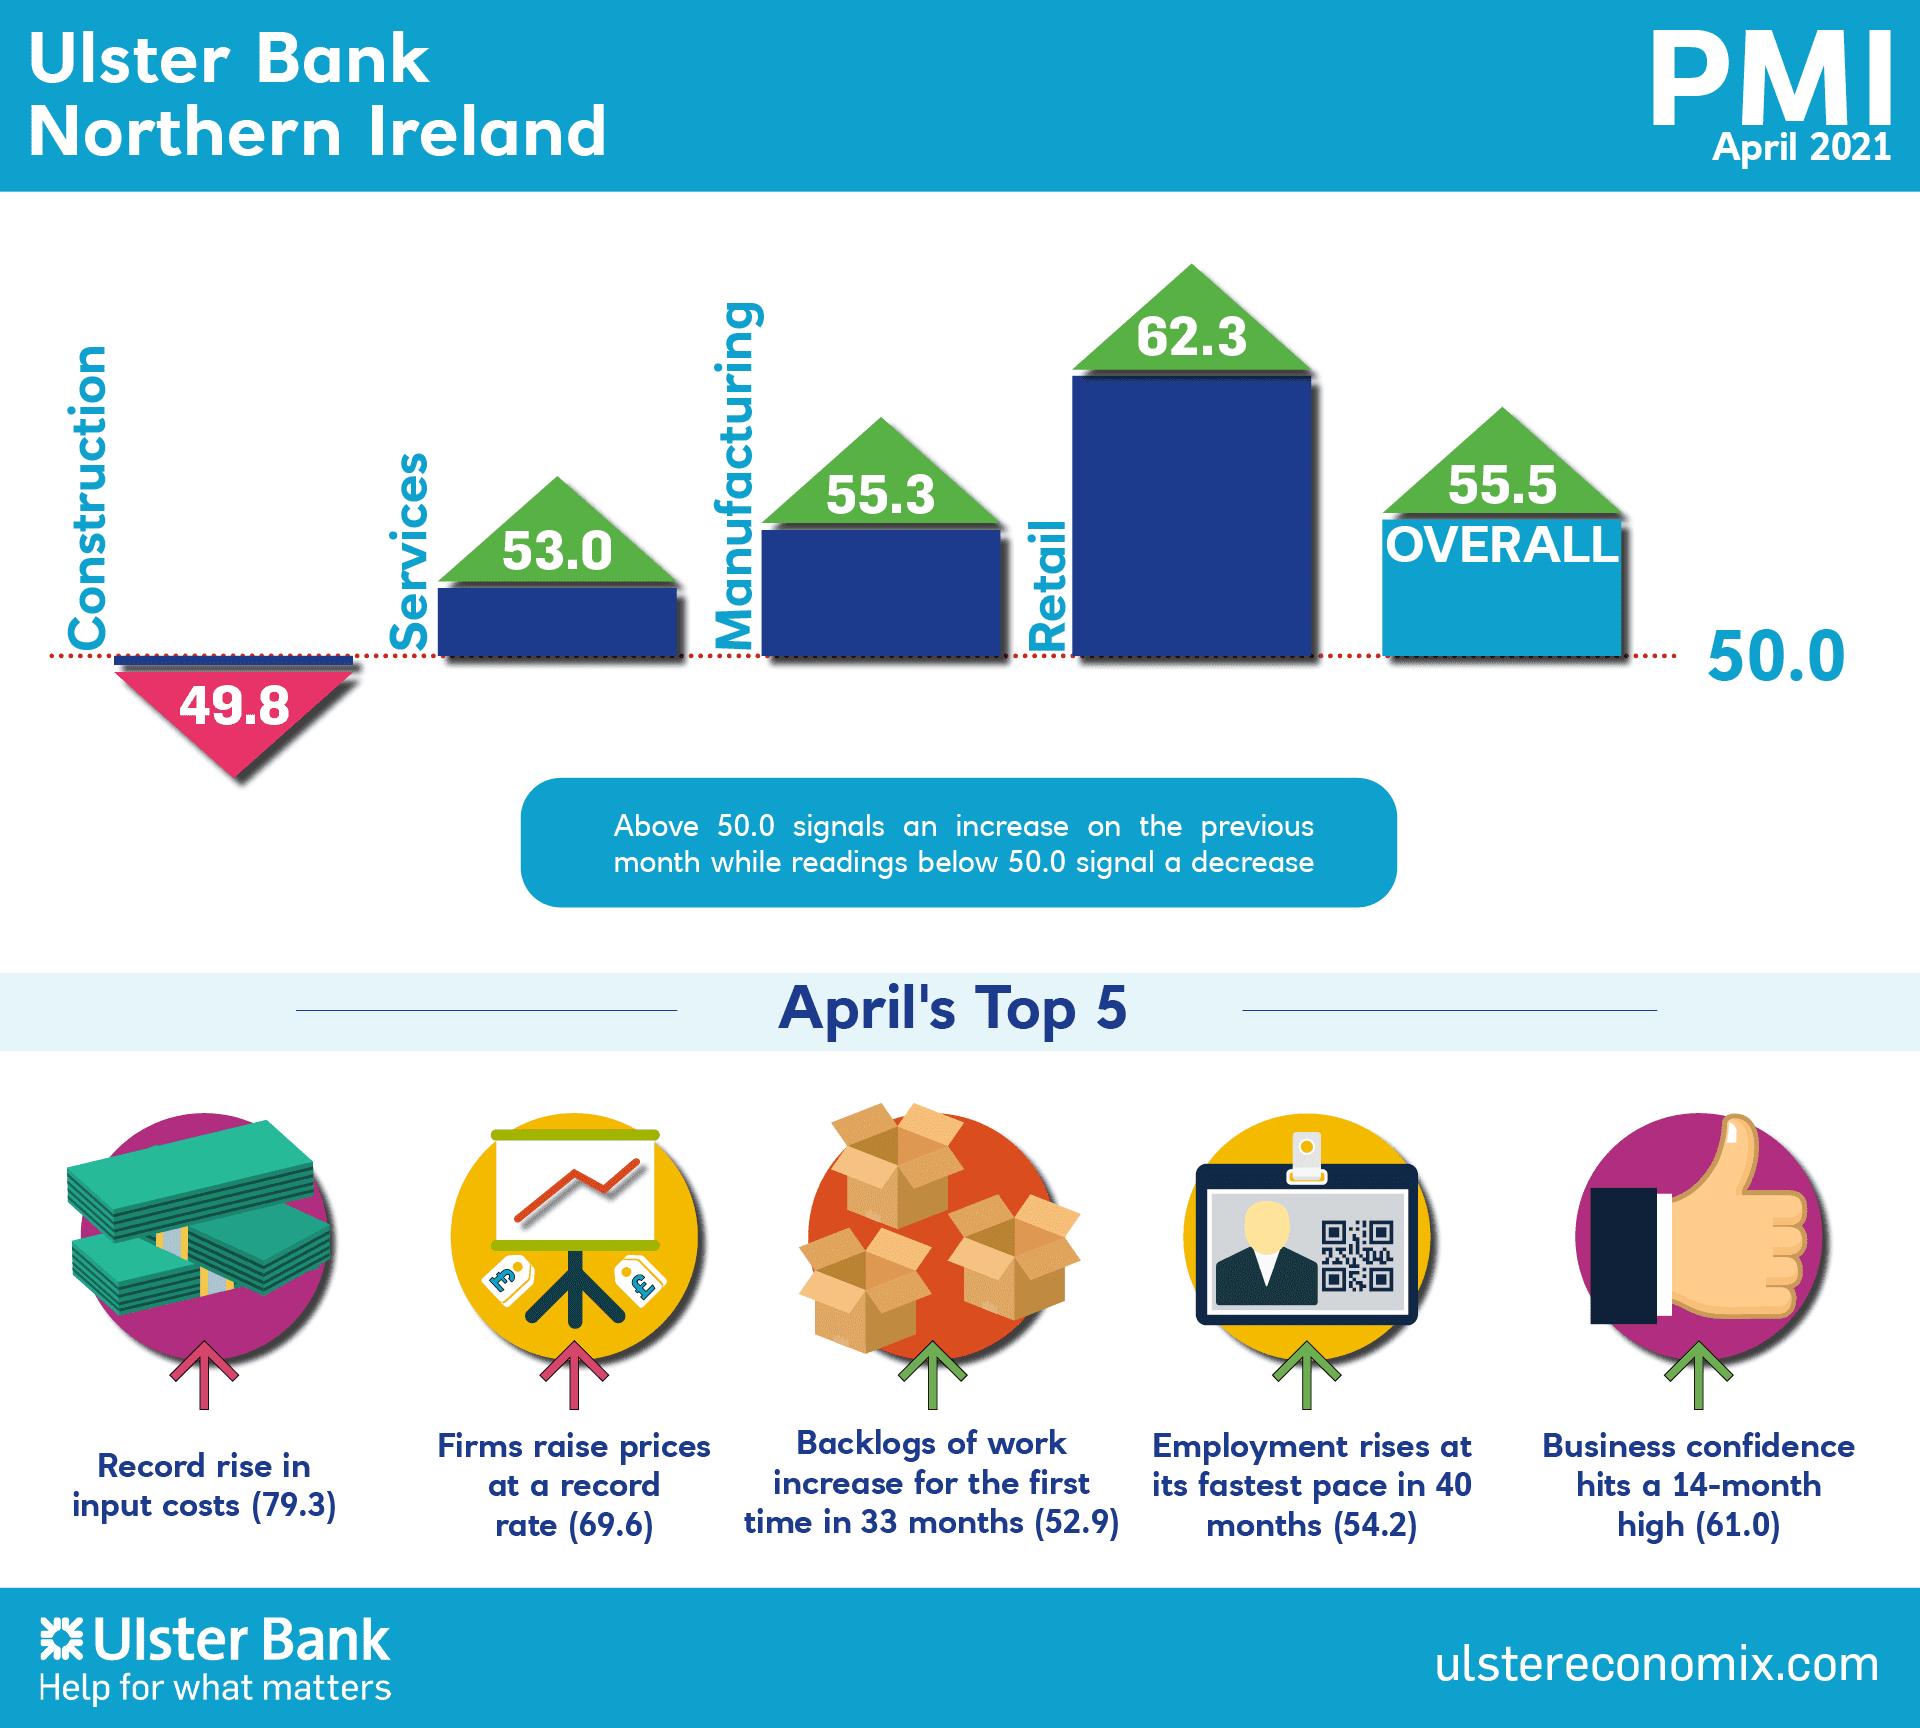 Ulster Bank Northern Ireland PMI